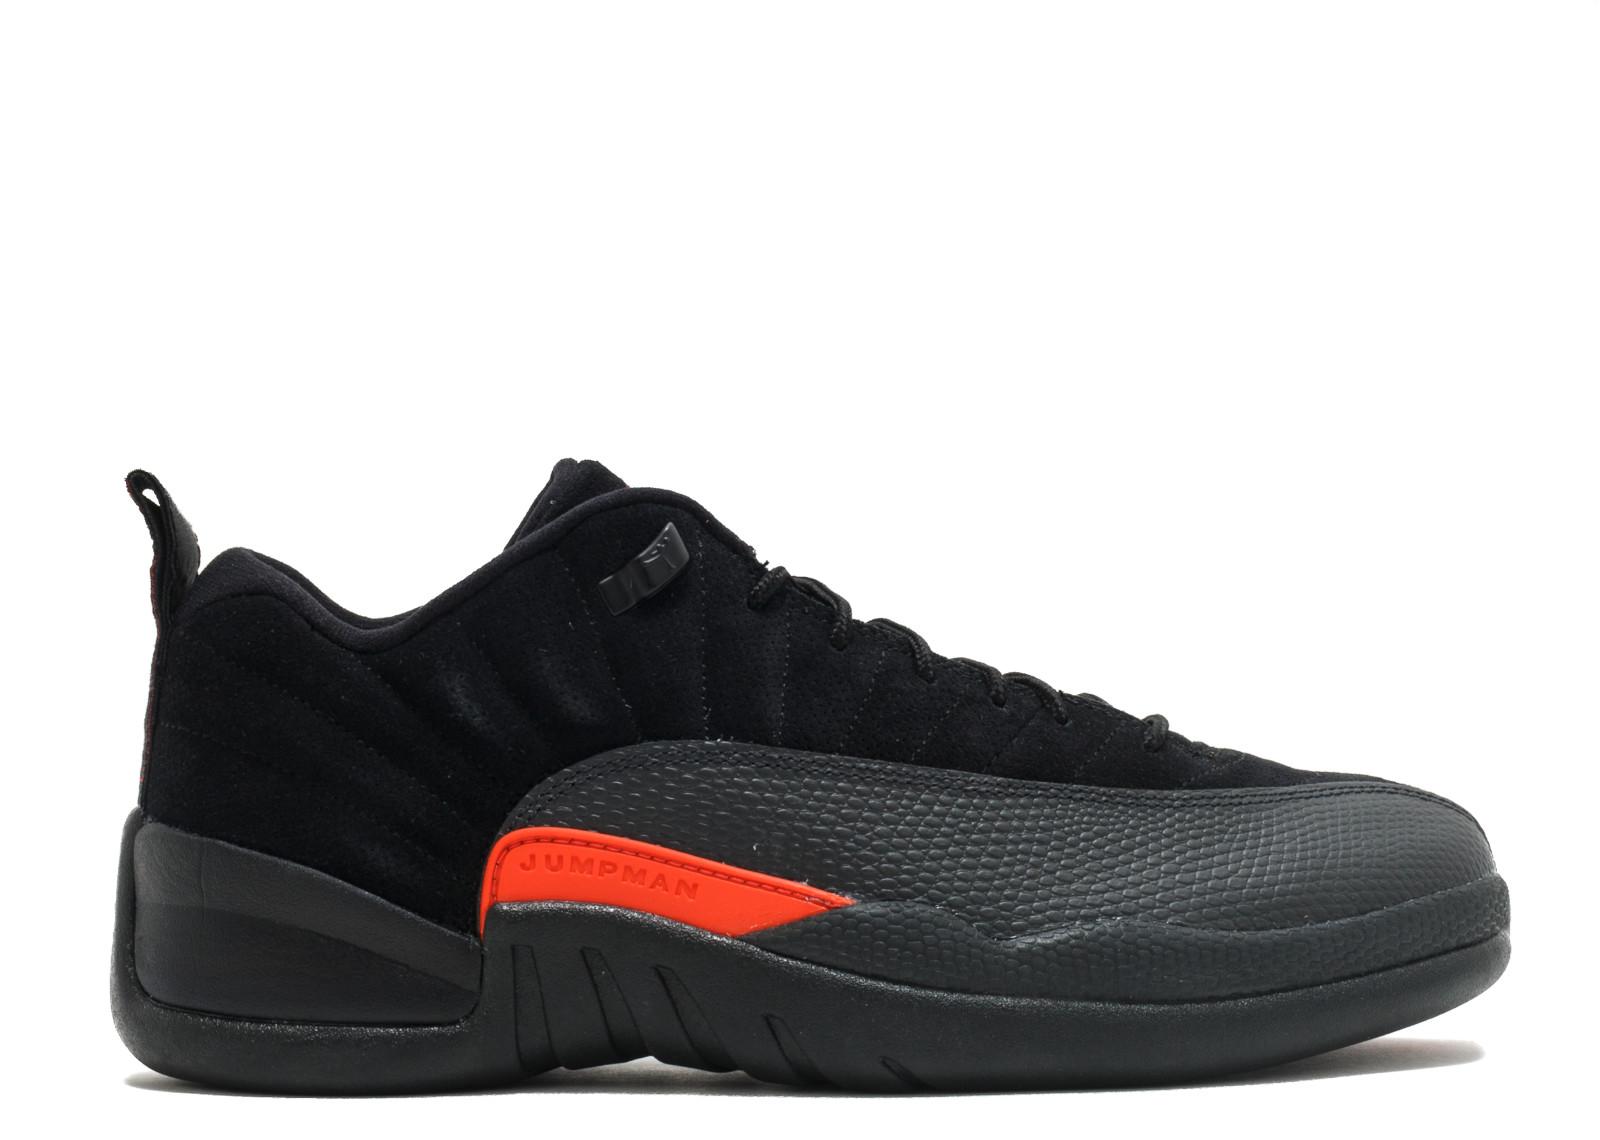 classic fit 18d93 f4fbc Air Jordan - Men - Air Jordan 12 Low Retro 'Max Orange' - 308317-003 - Size  9